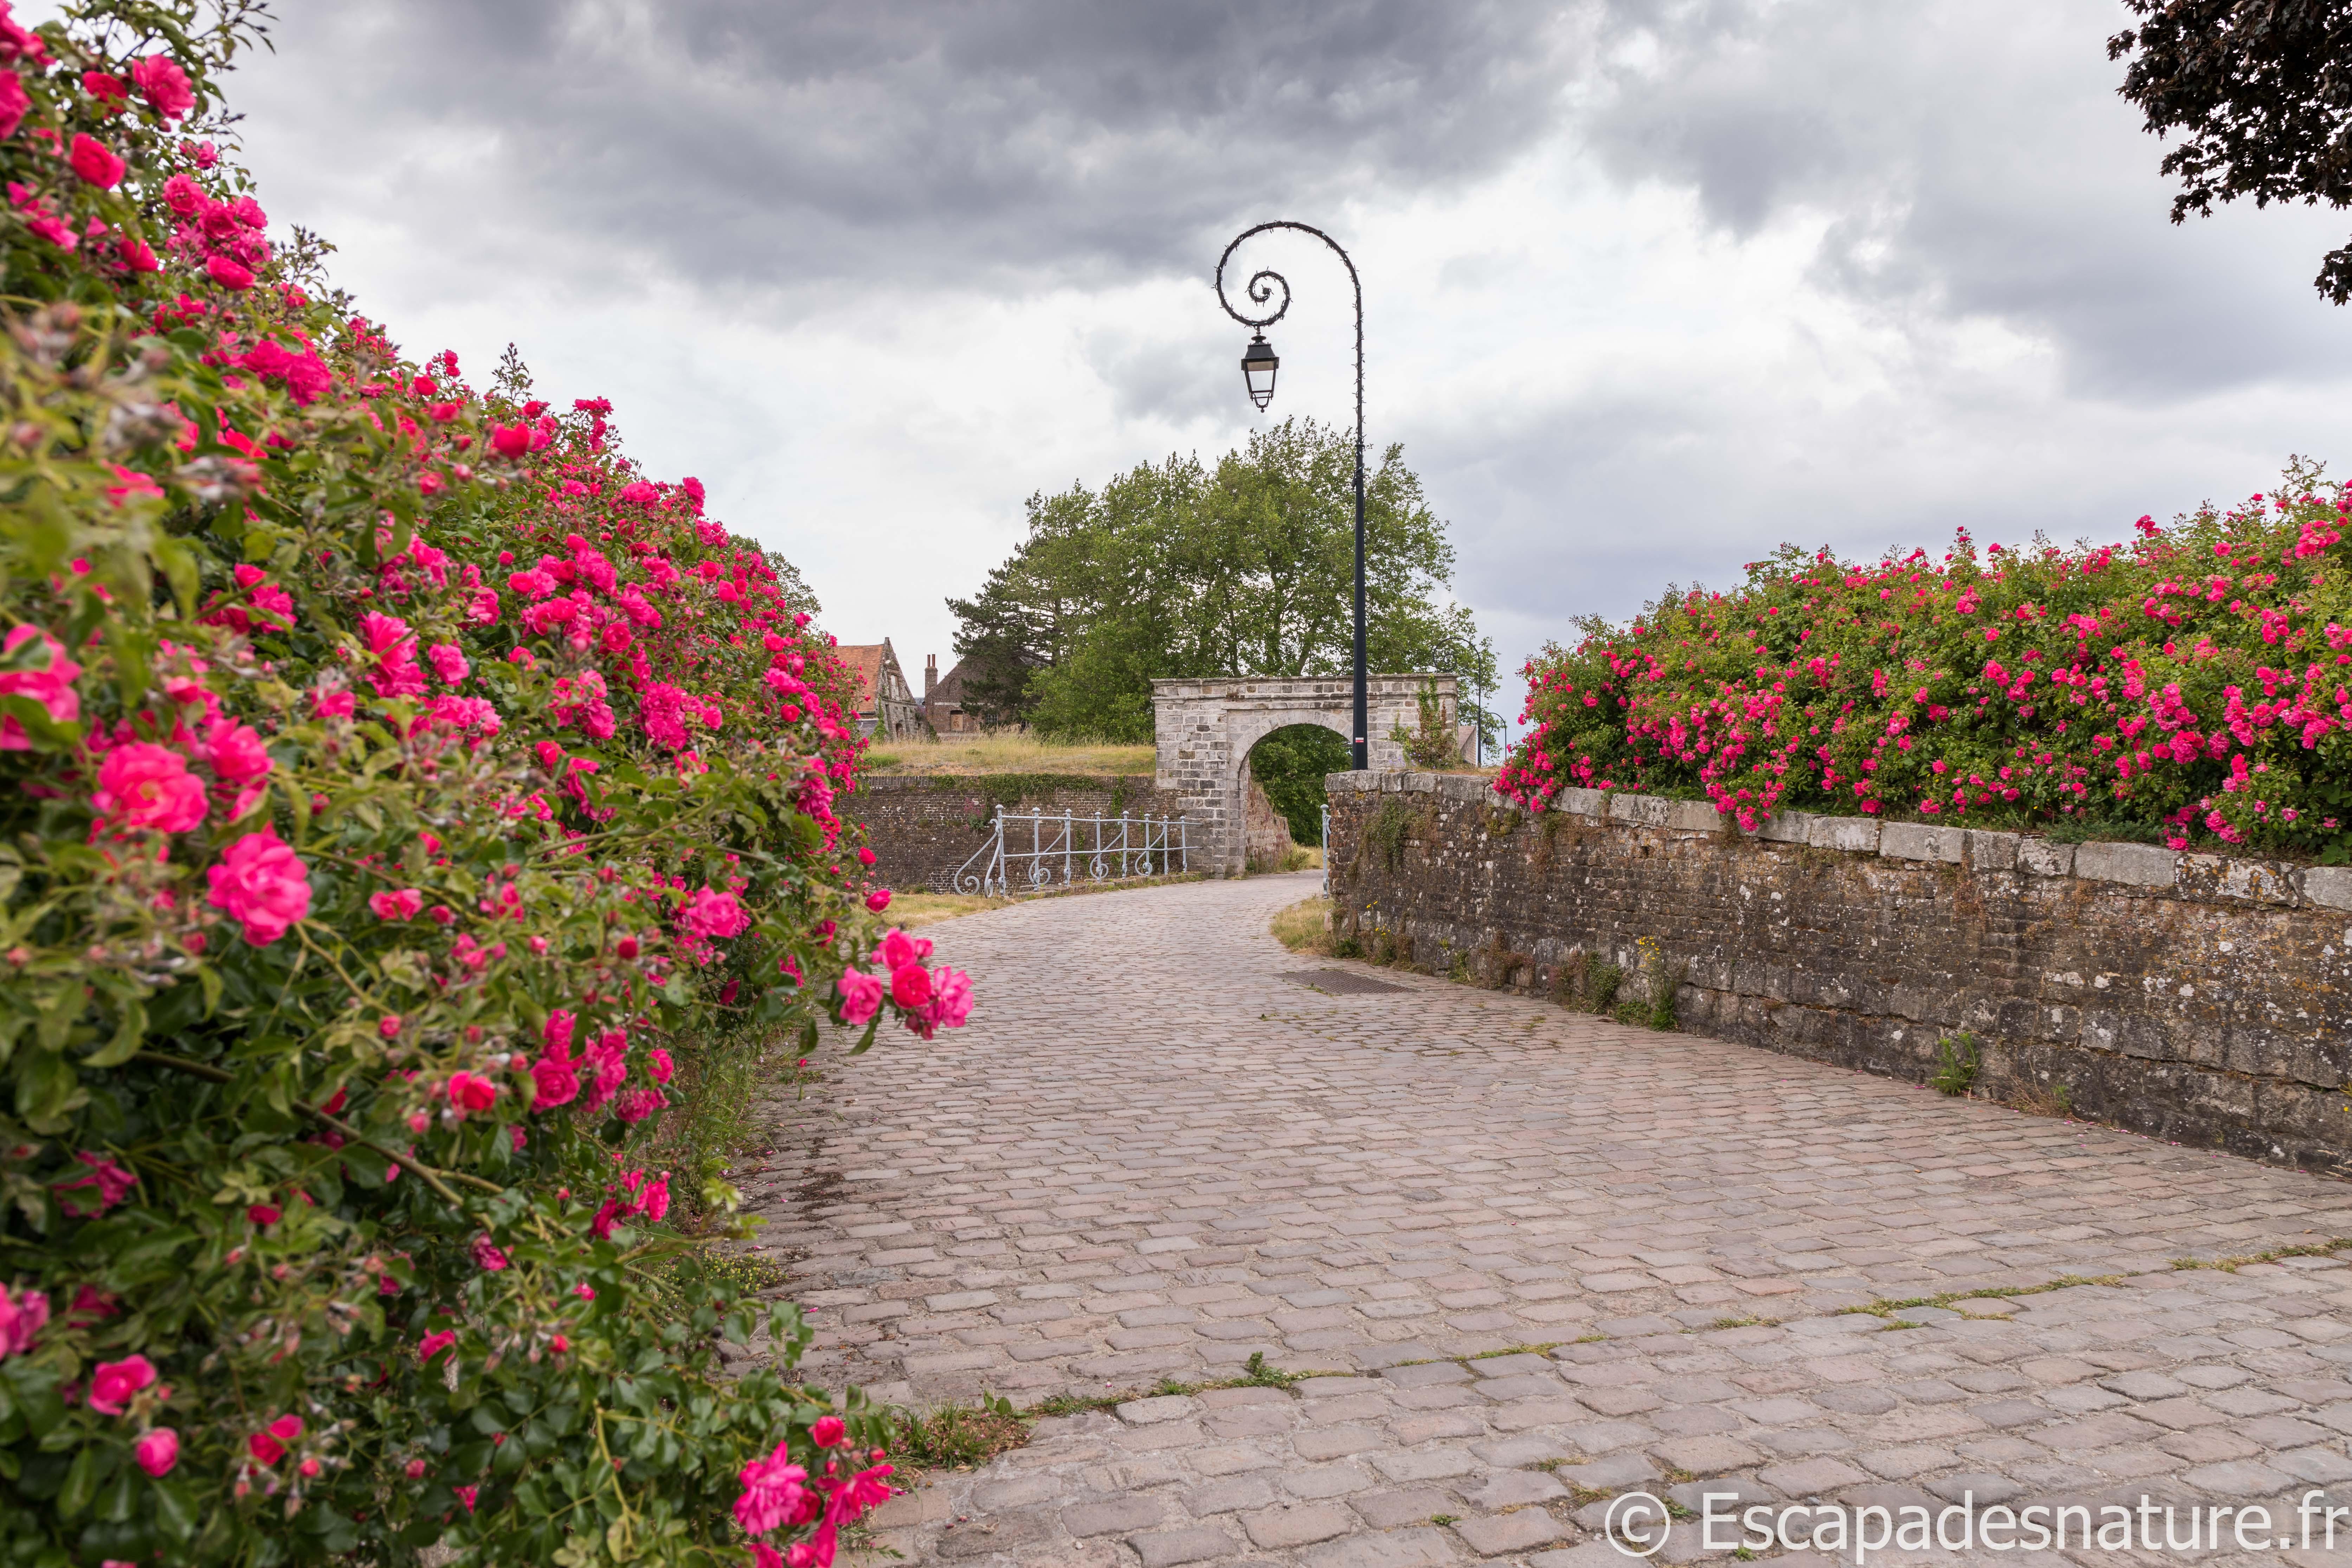 LA CITE FORTIFIEE DE MONTREUIL-SUR-MER